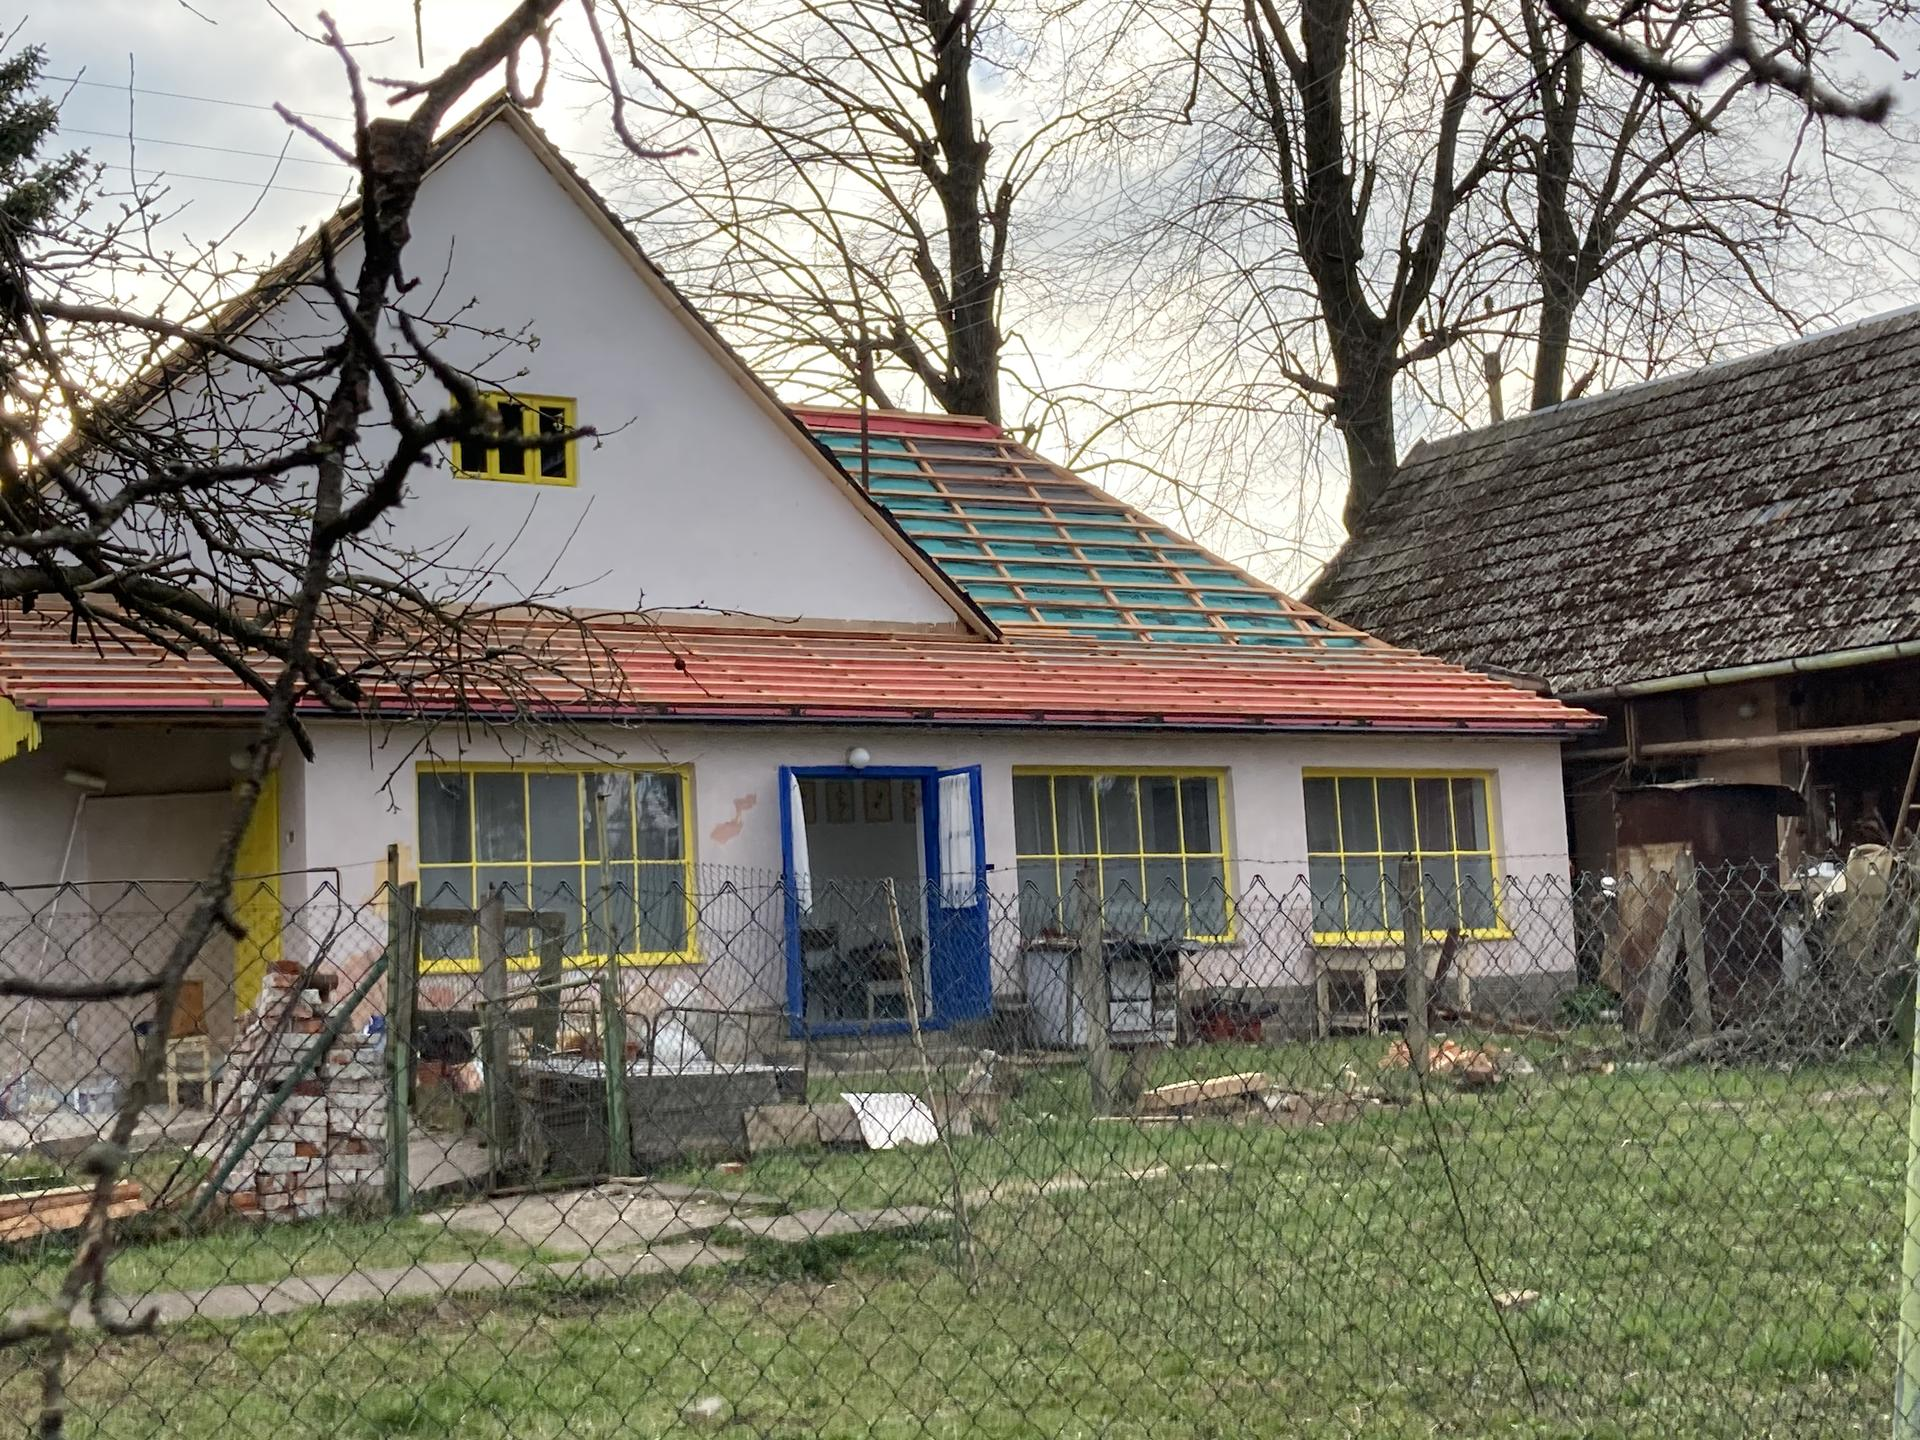 Dom - Obrázok č. 239